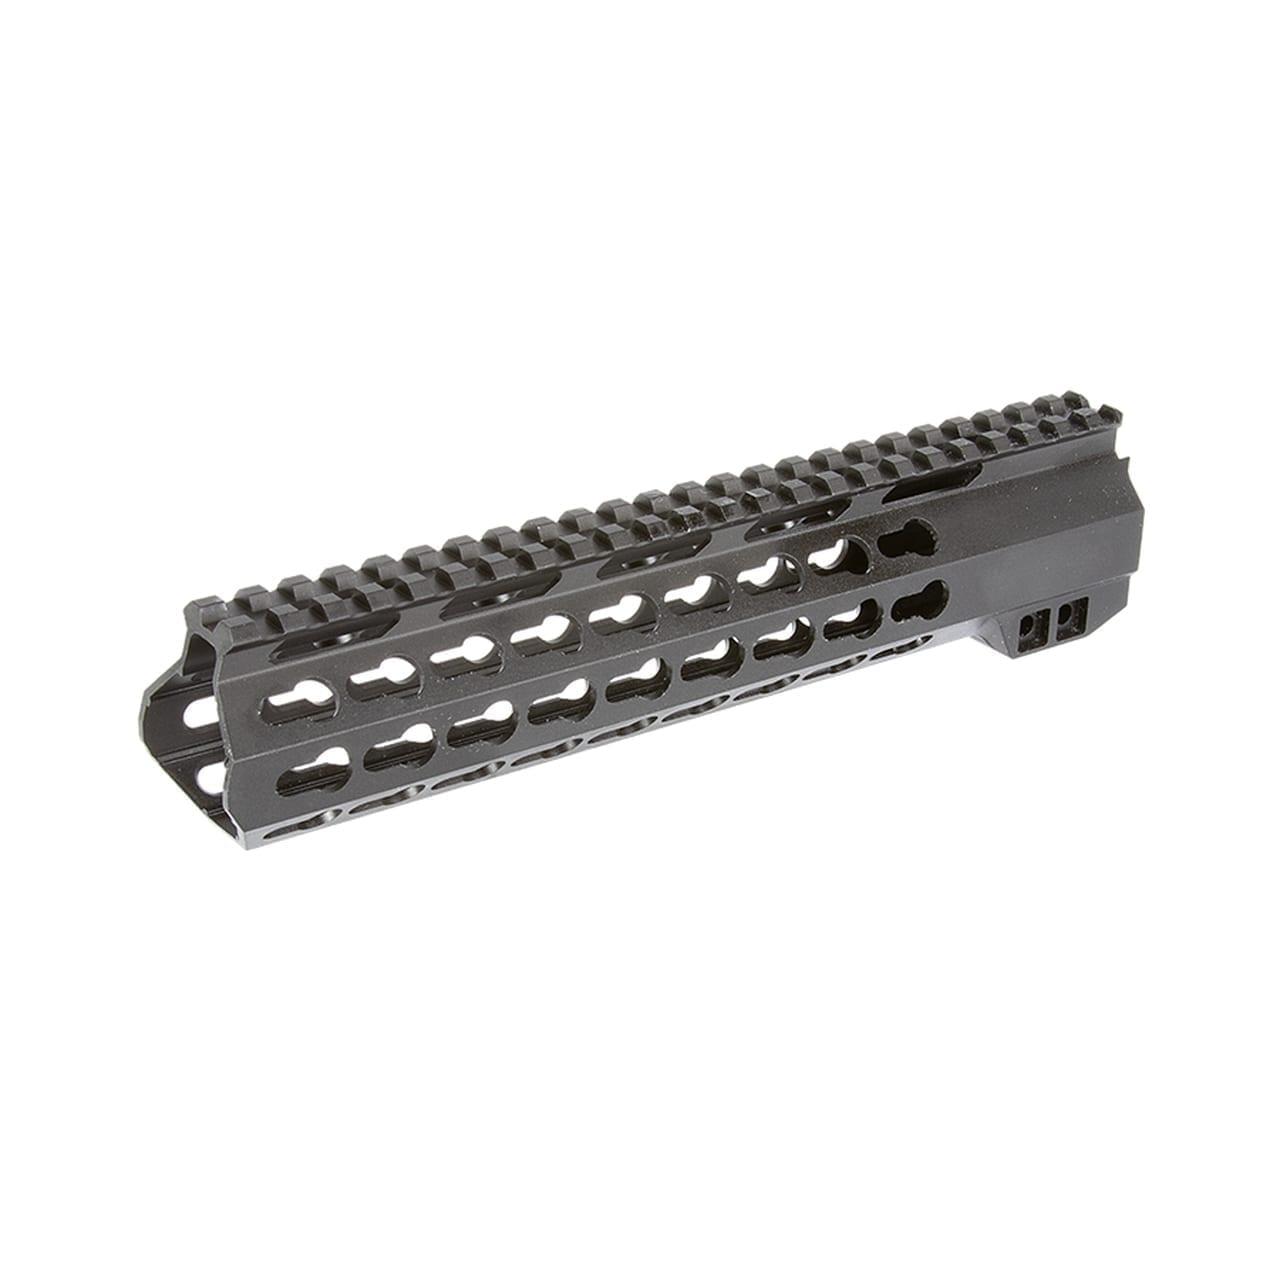 AR15 10'' Keymod Free Float Rail System with Steel Barrel Nut